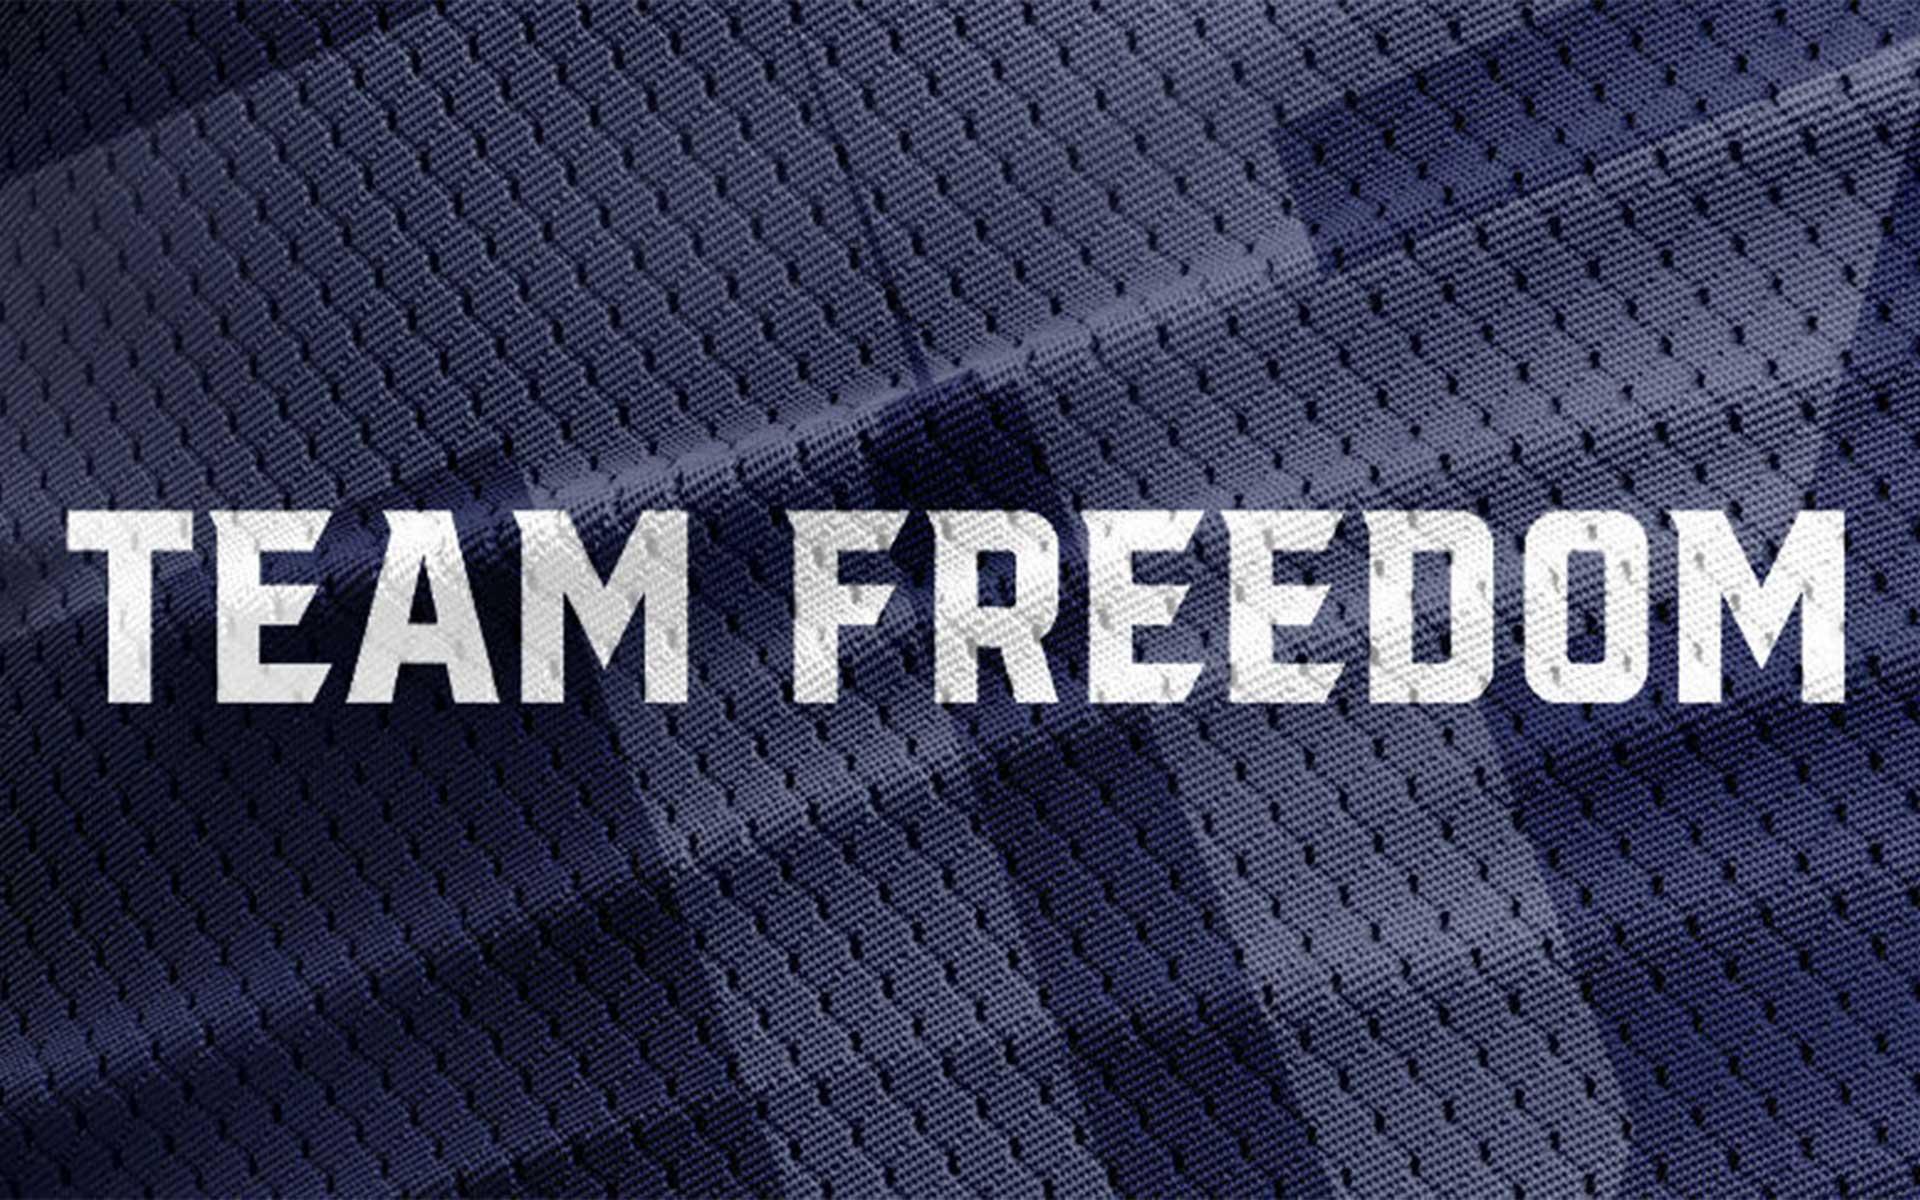 TeamFreedom1